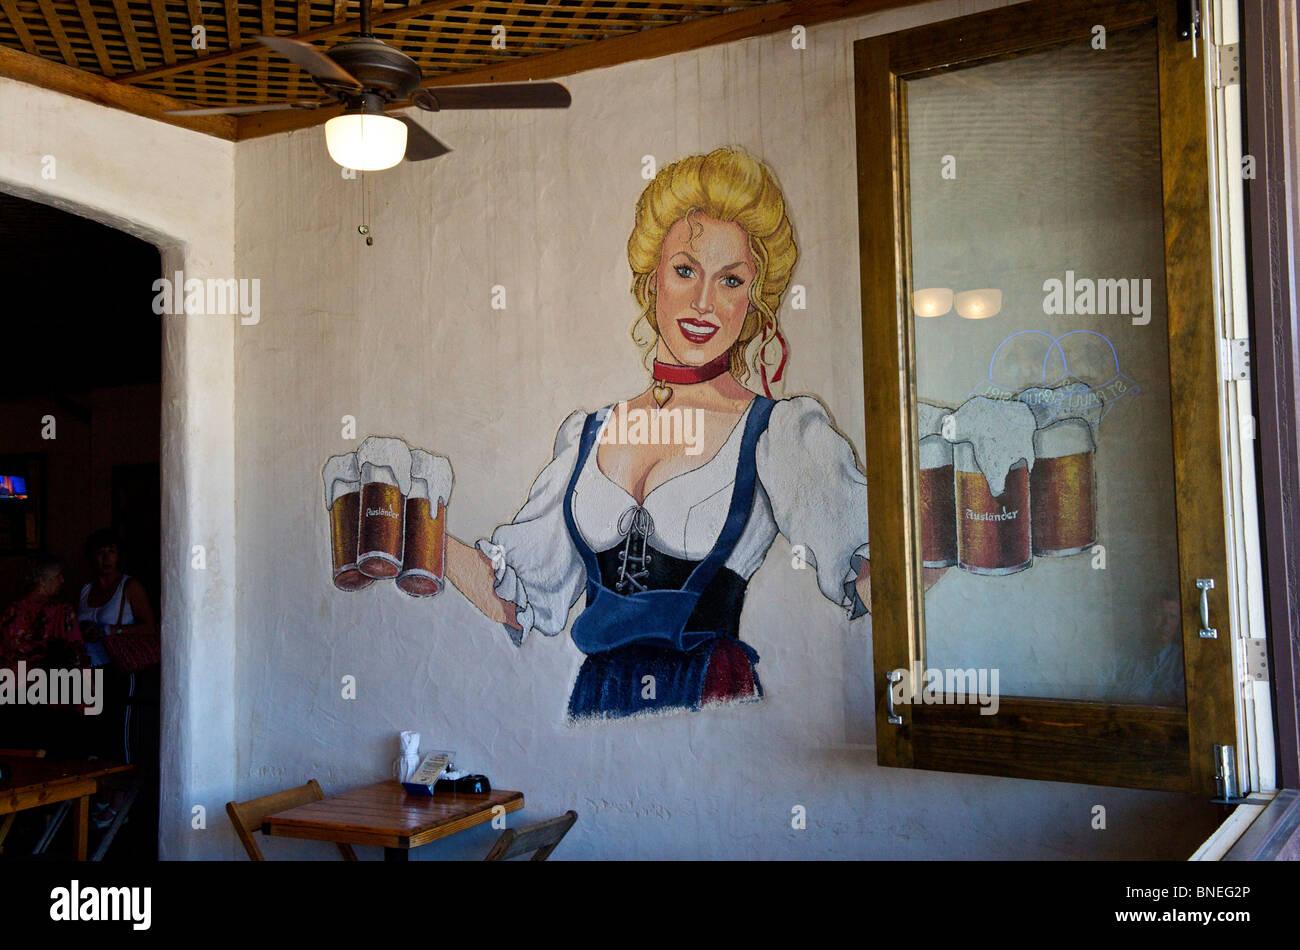 Auslander Biergarten e ristorante Hill Country Fredericksburg, Texas, Stati Uniti d'America Foto Stock